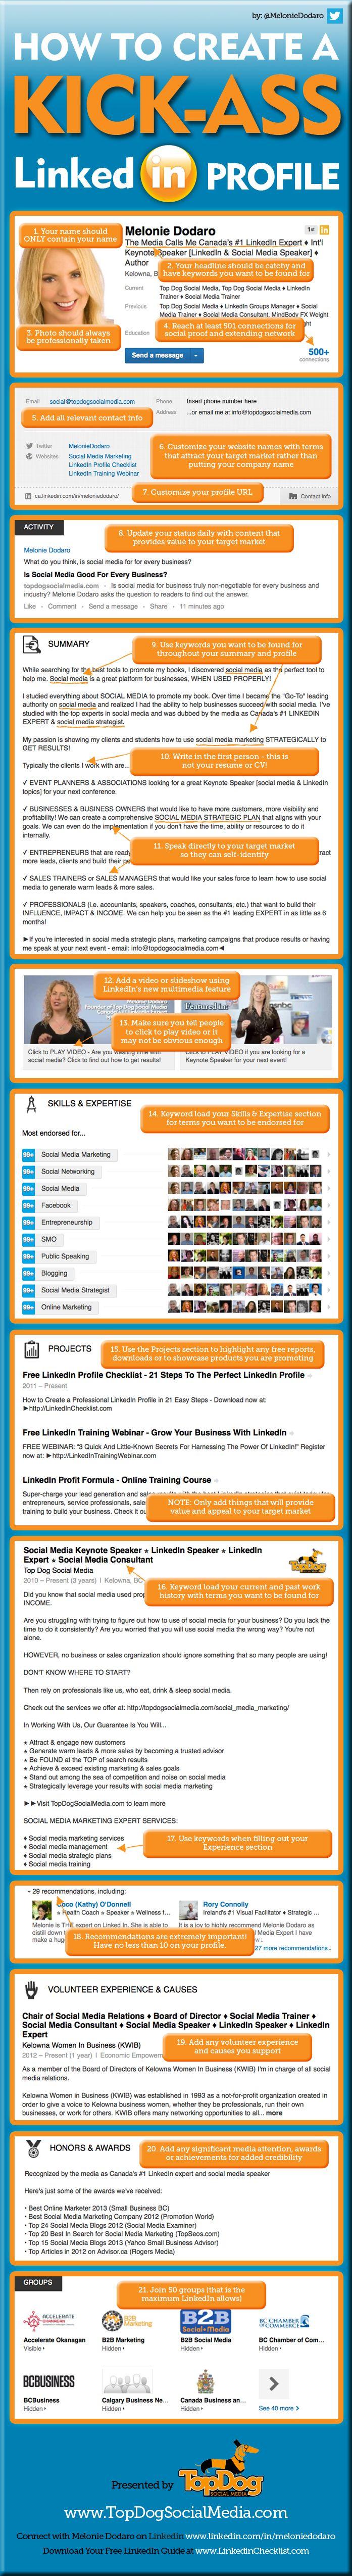 92 best Social Media Training, Tips & Infographics images on ...